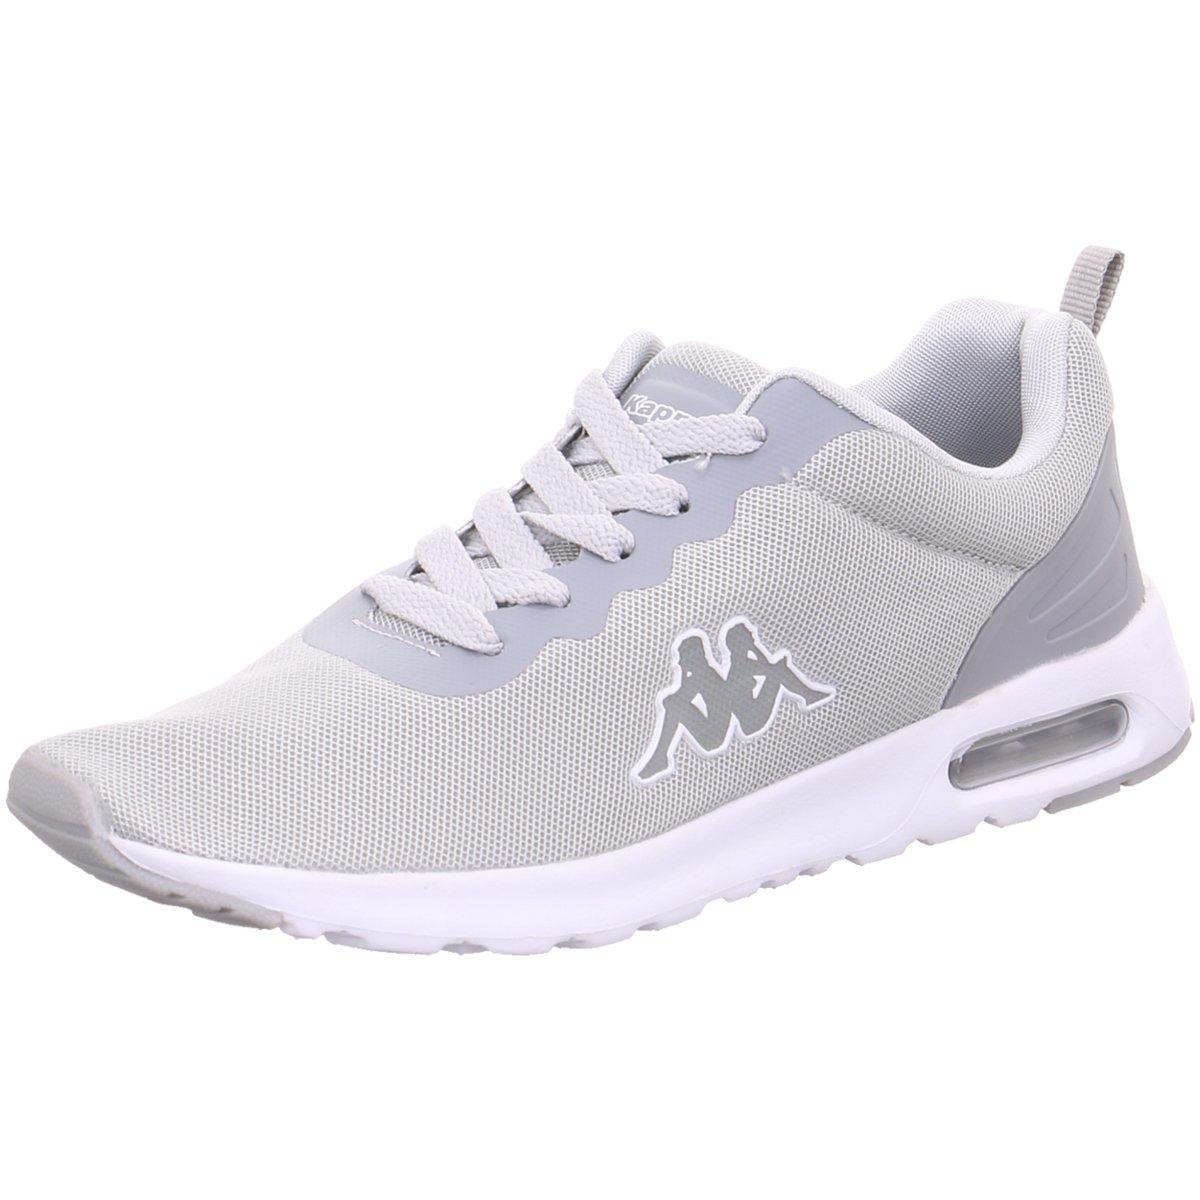 new product e46f3 451ac NEU KAPPA DAMEN Sneaker Schnürhalbschuh CLASSY 242194-1410 grau 398536